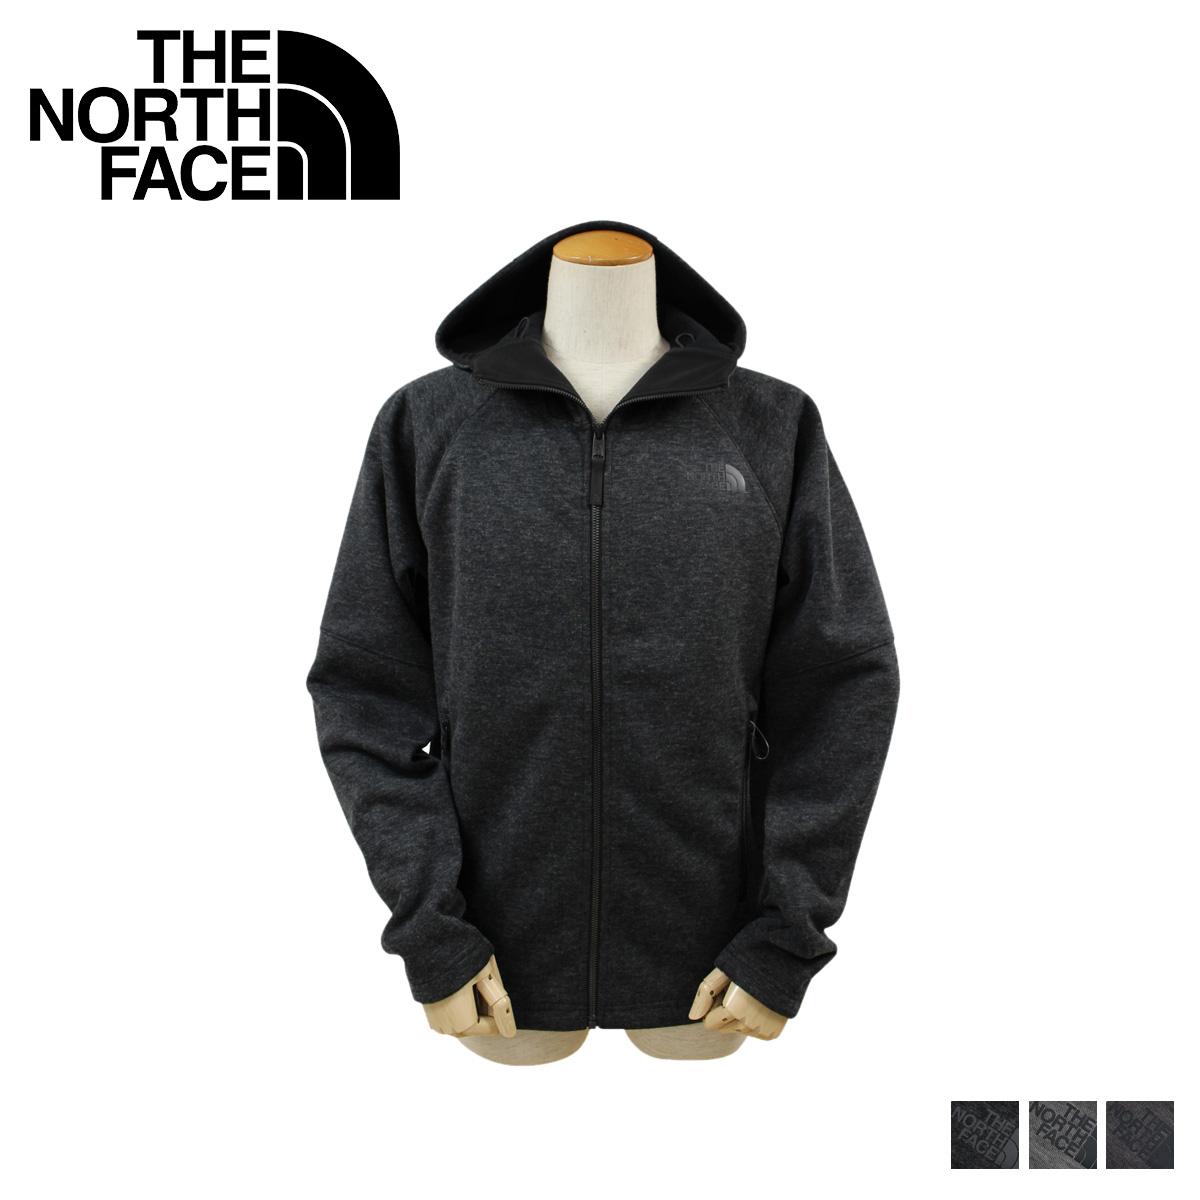 THE NORTH FACE ノースフェイス ジャケット パーカー フリースパーカー MEN'S FAR NORTHERN HOODIE NF0A2TBD メンズ